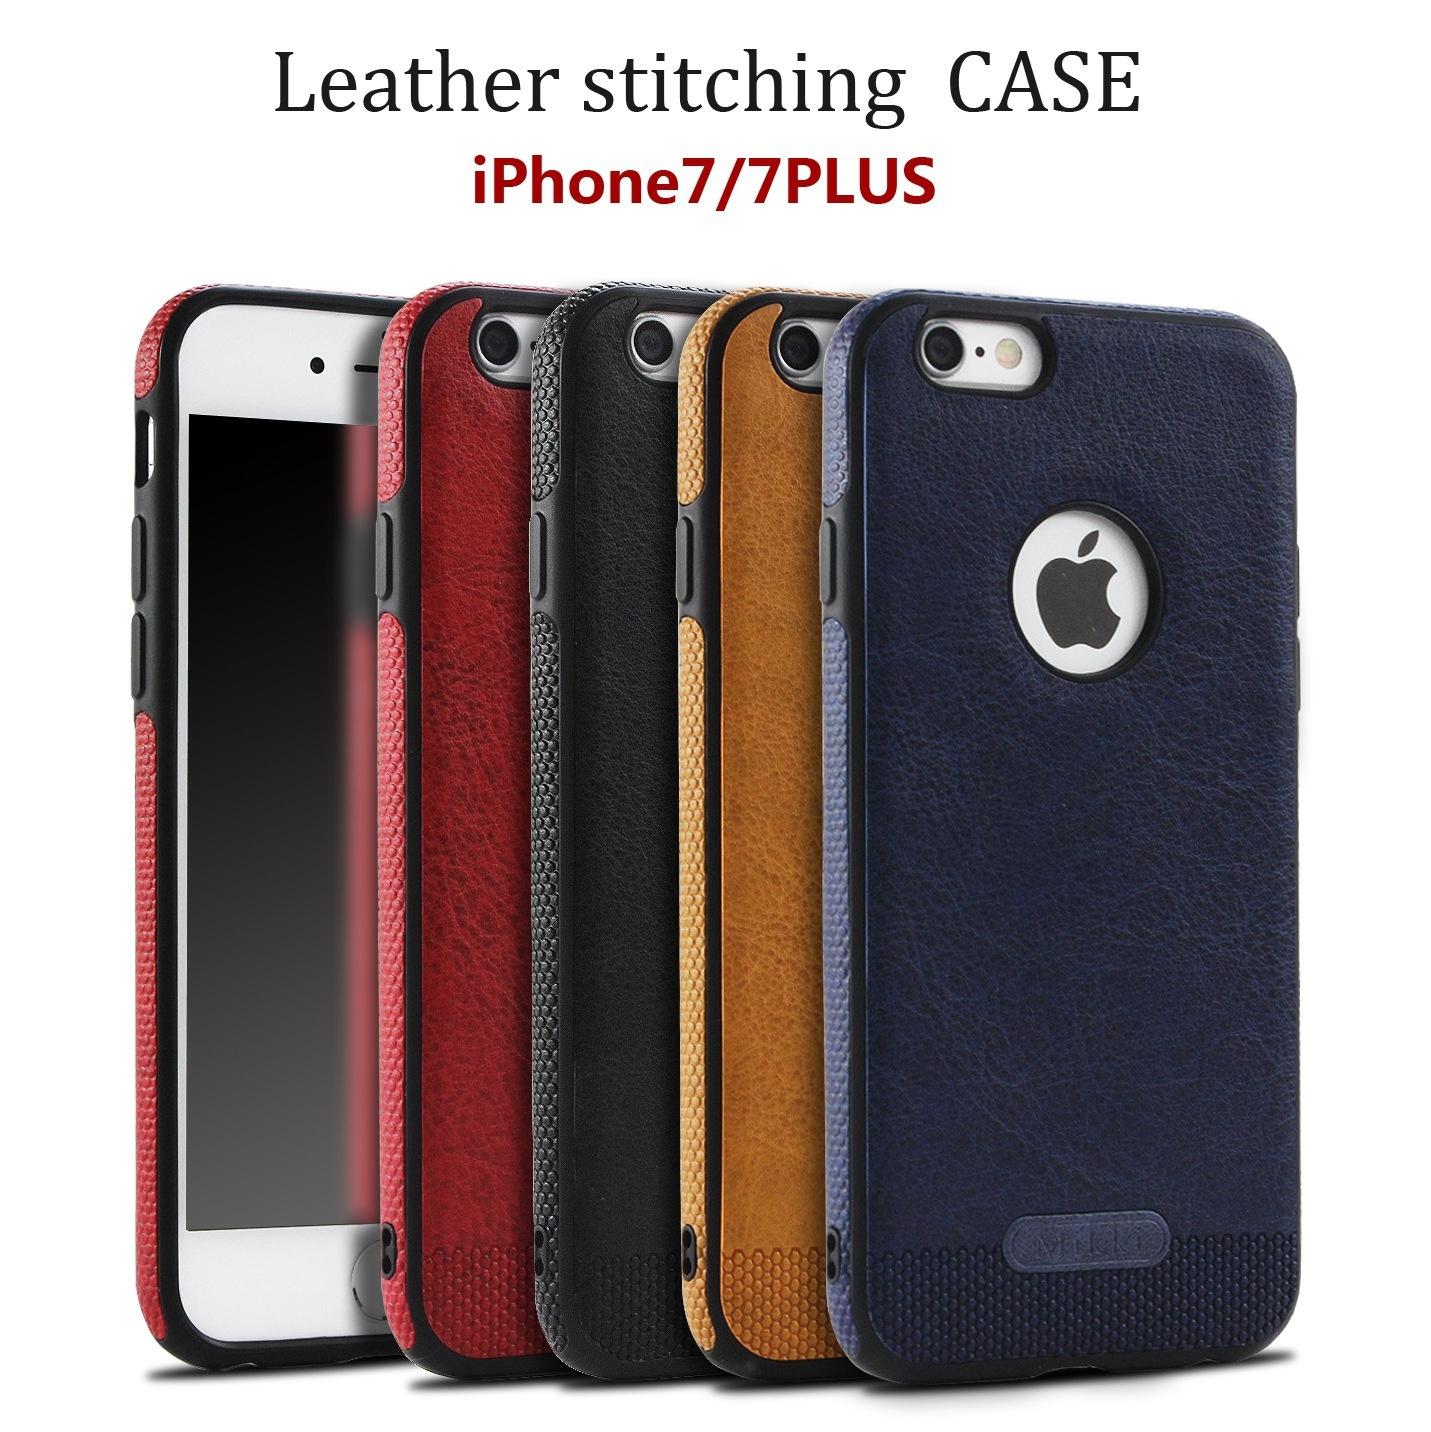 Мягкий защитный чехол для iPhone, Samsung Galaxy samsung le40a656a